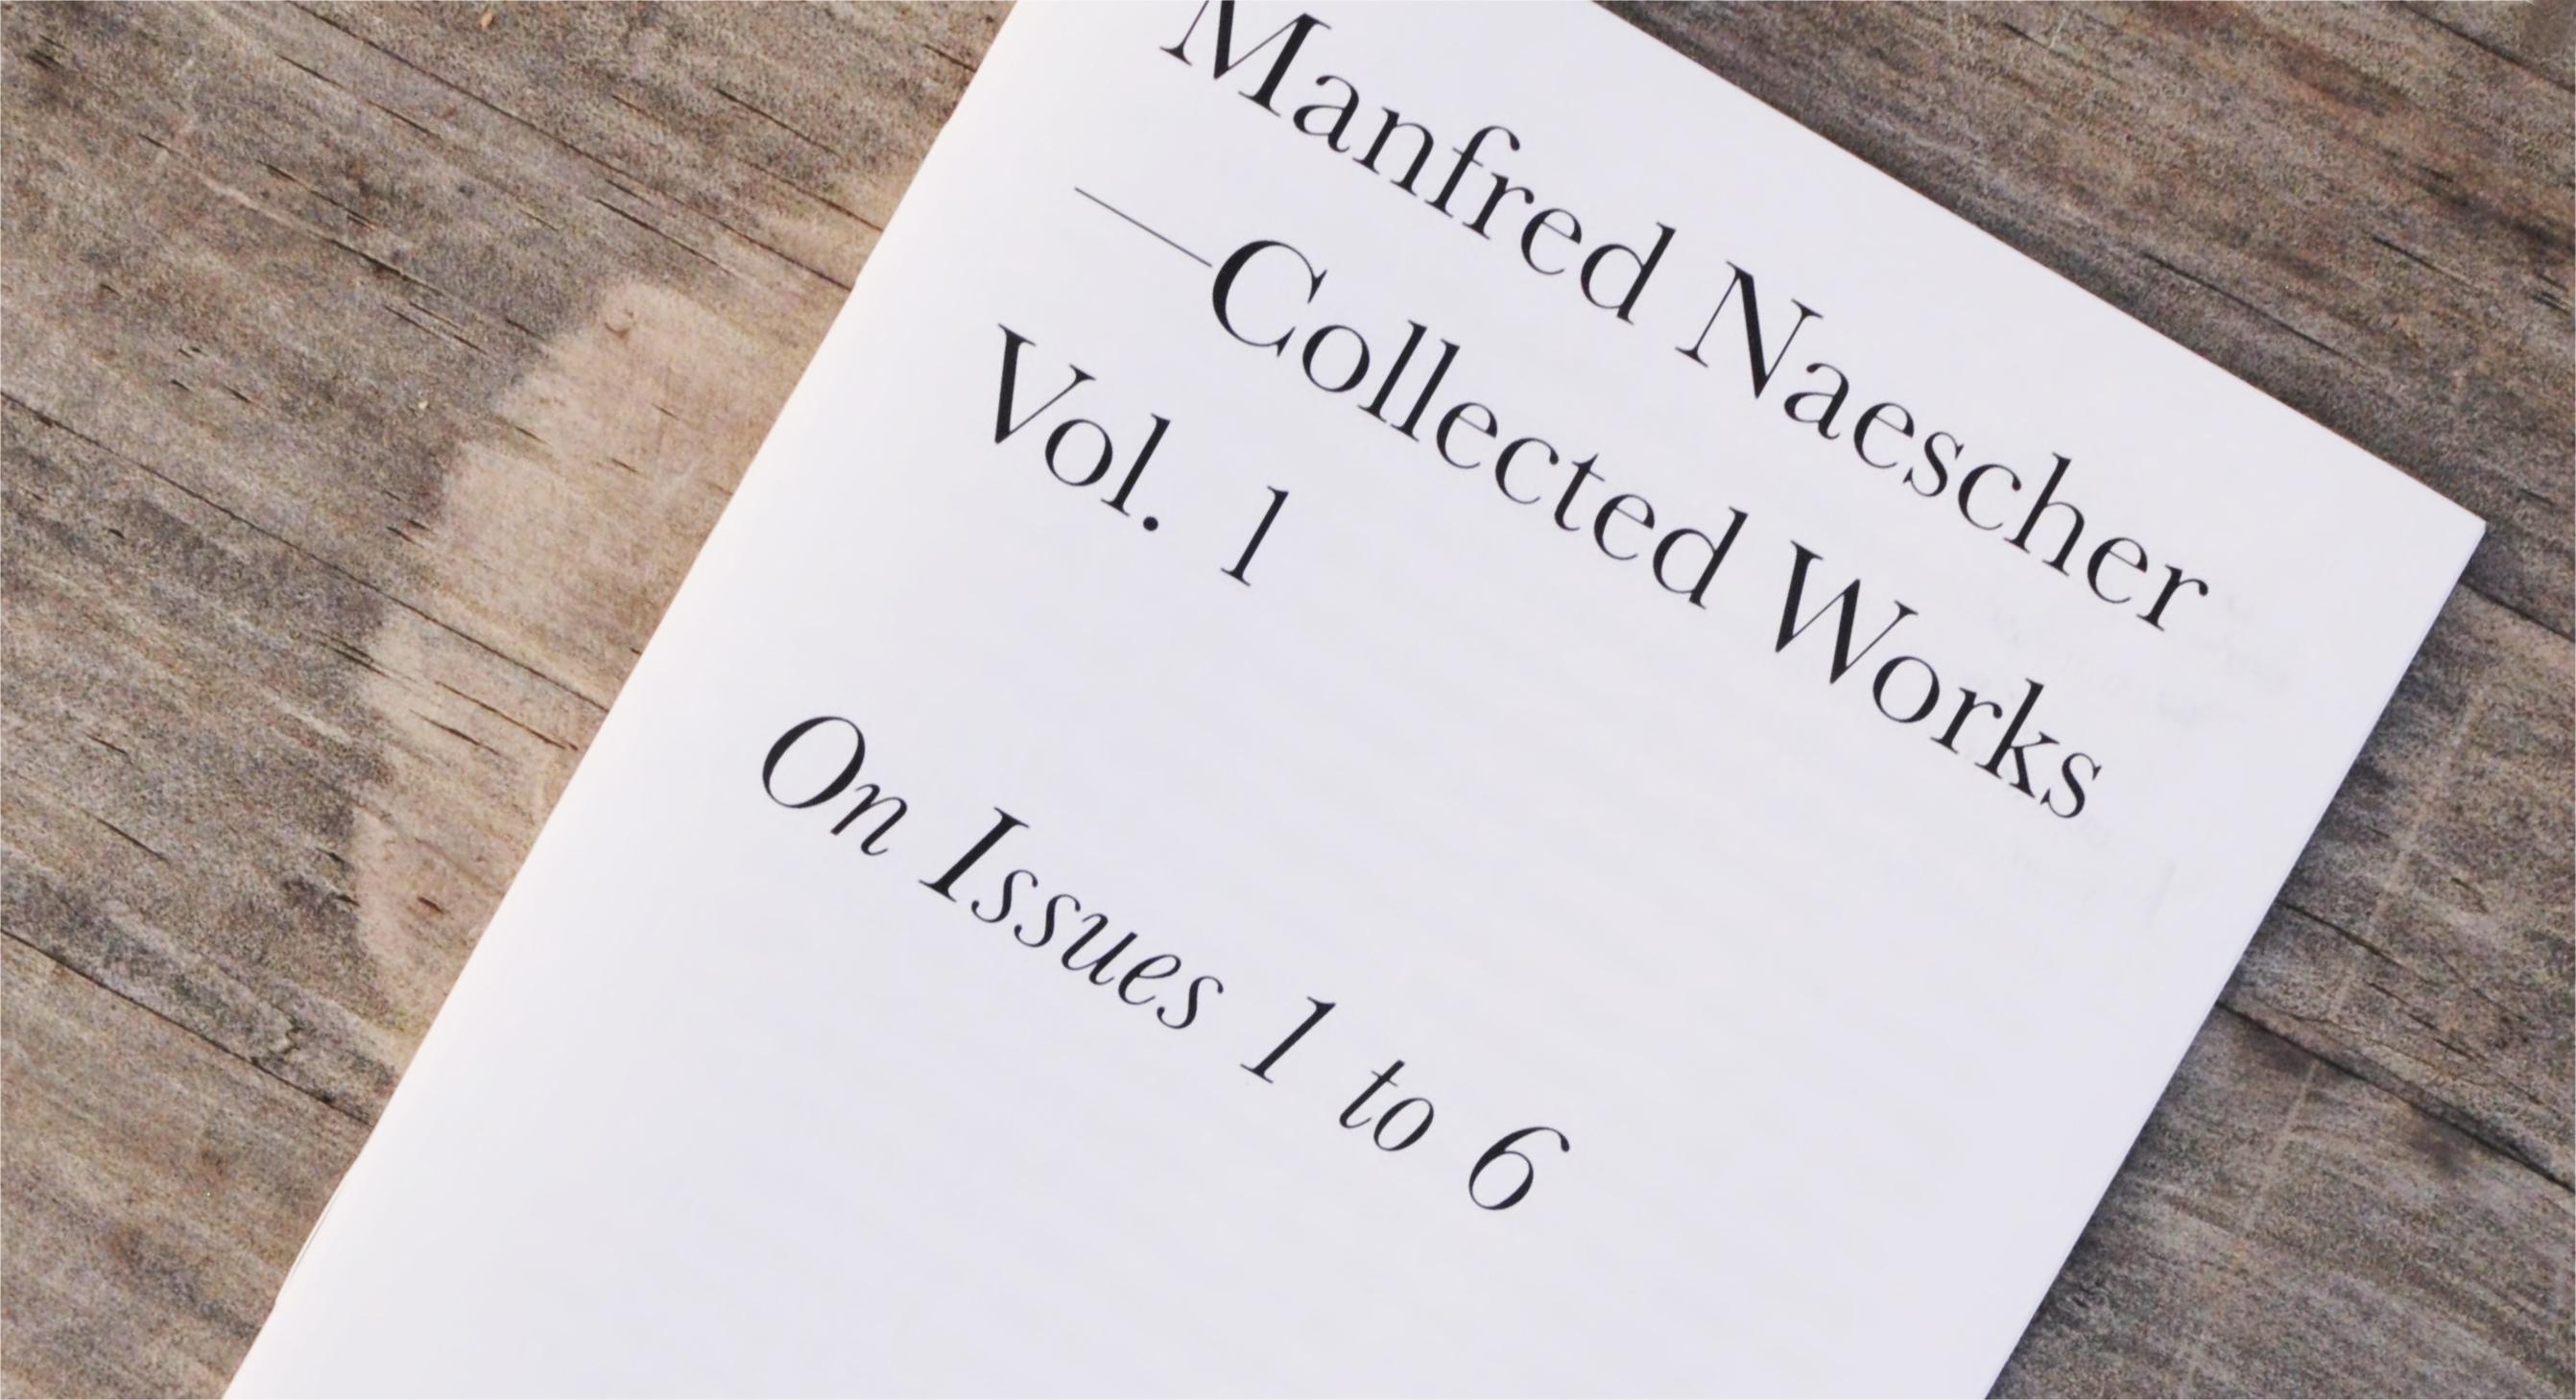 manfred_naescher_cw_vol_1_essay_booklet_cover.jpg